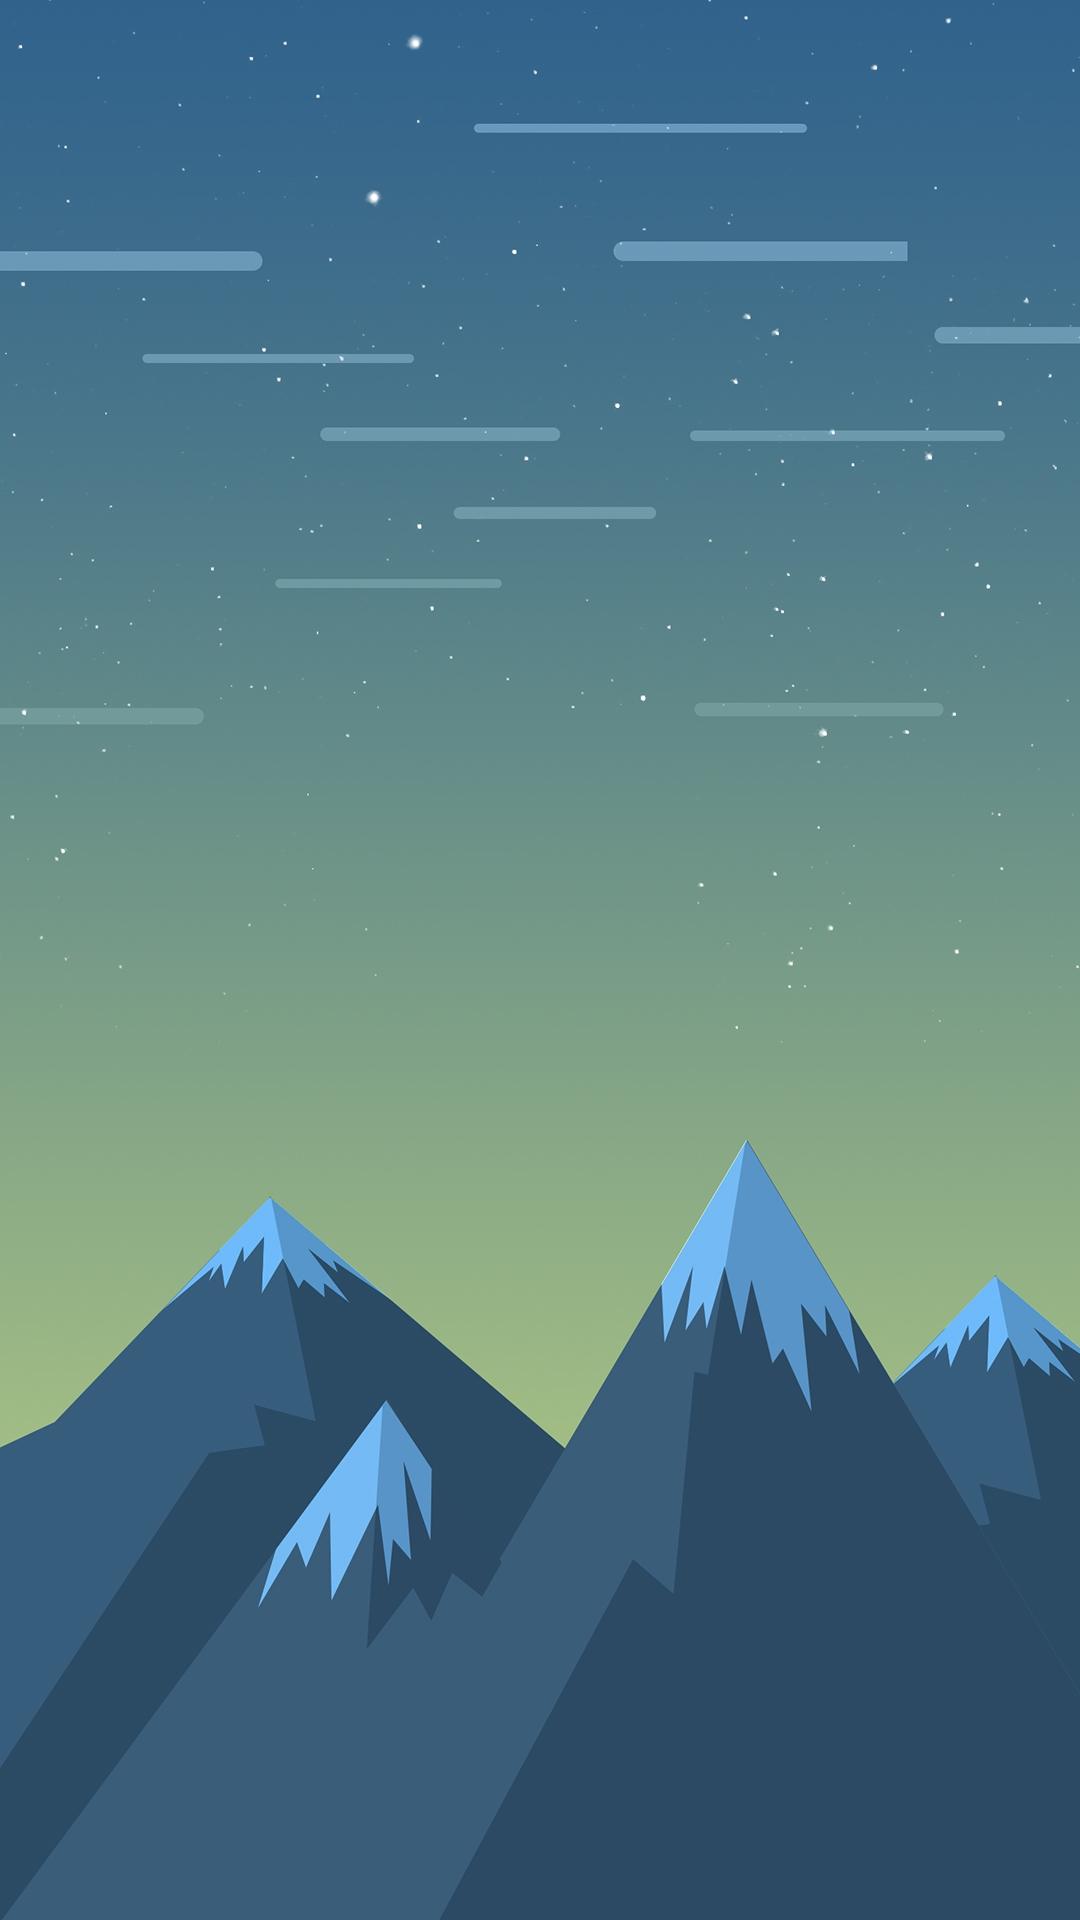 Minimal Mountains Stars iPhone Wallpaper iphoneswallpapers com